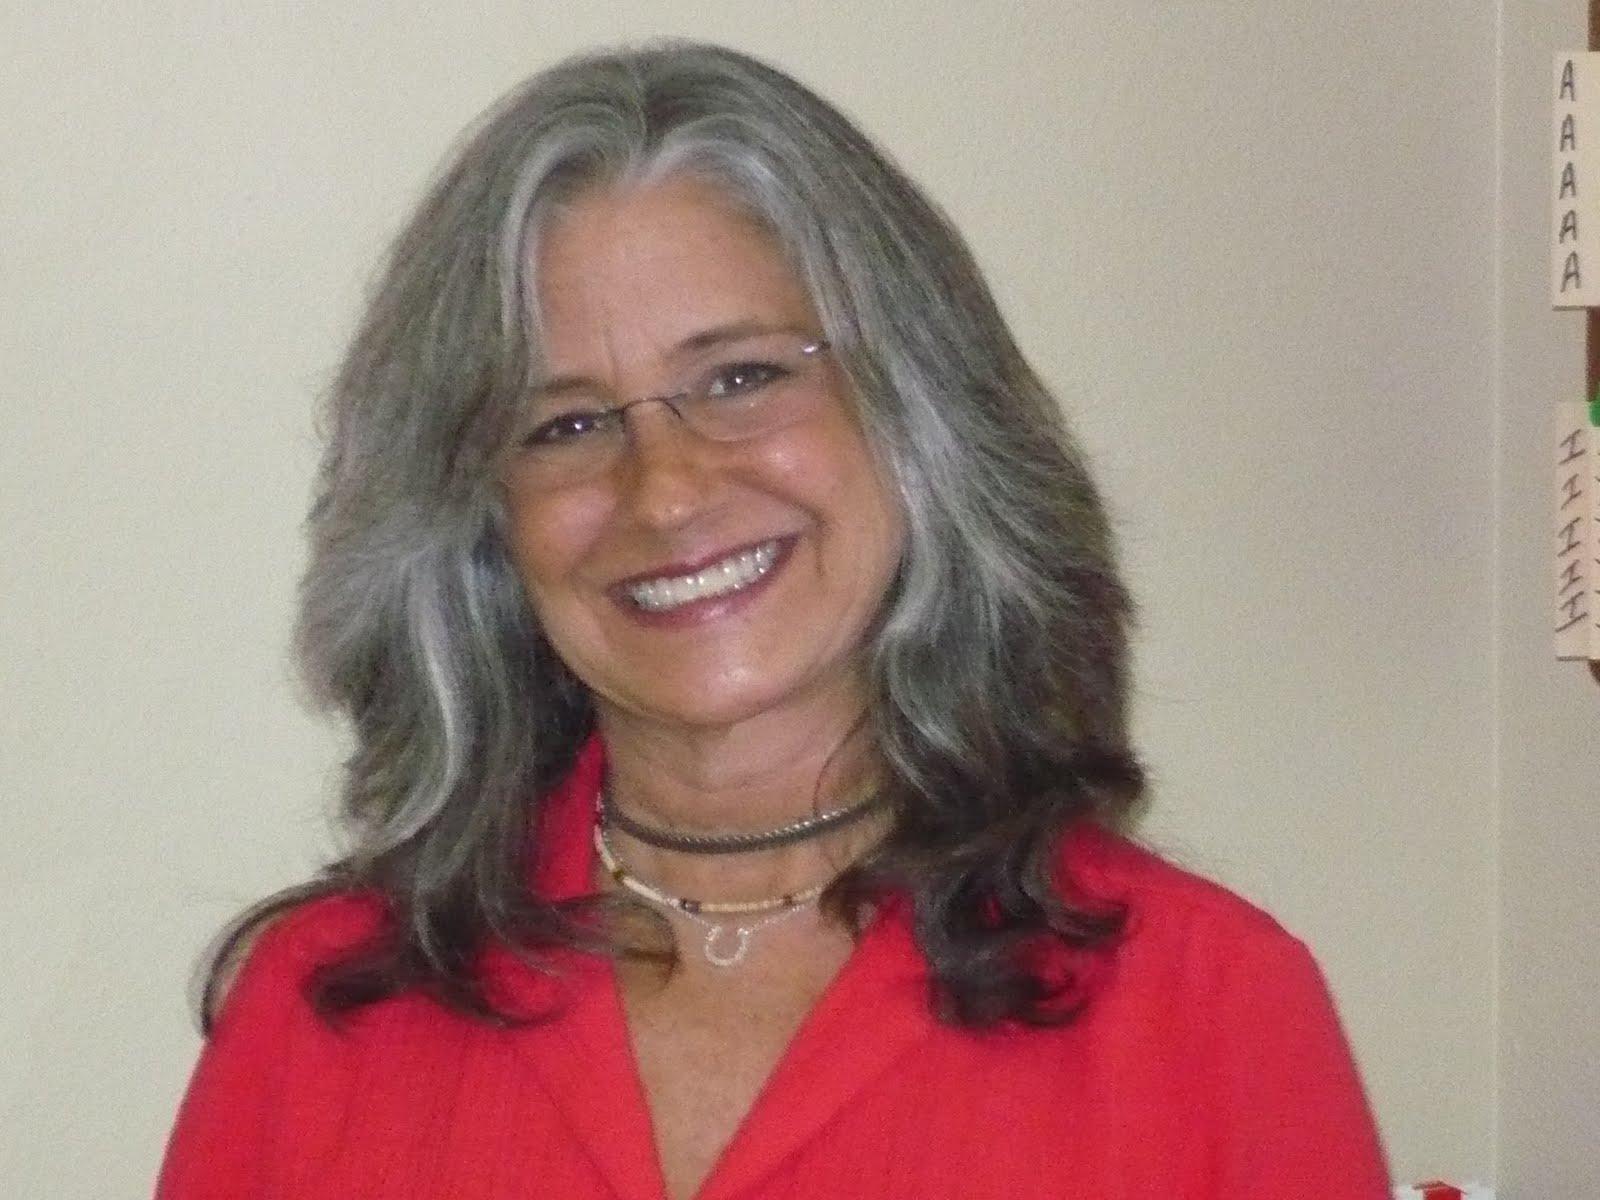 Communication on this topic: Christina Applegate born November 25, 1971 (age 46), barbara-couper/